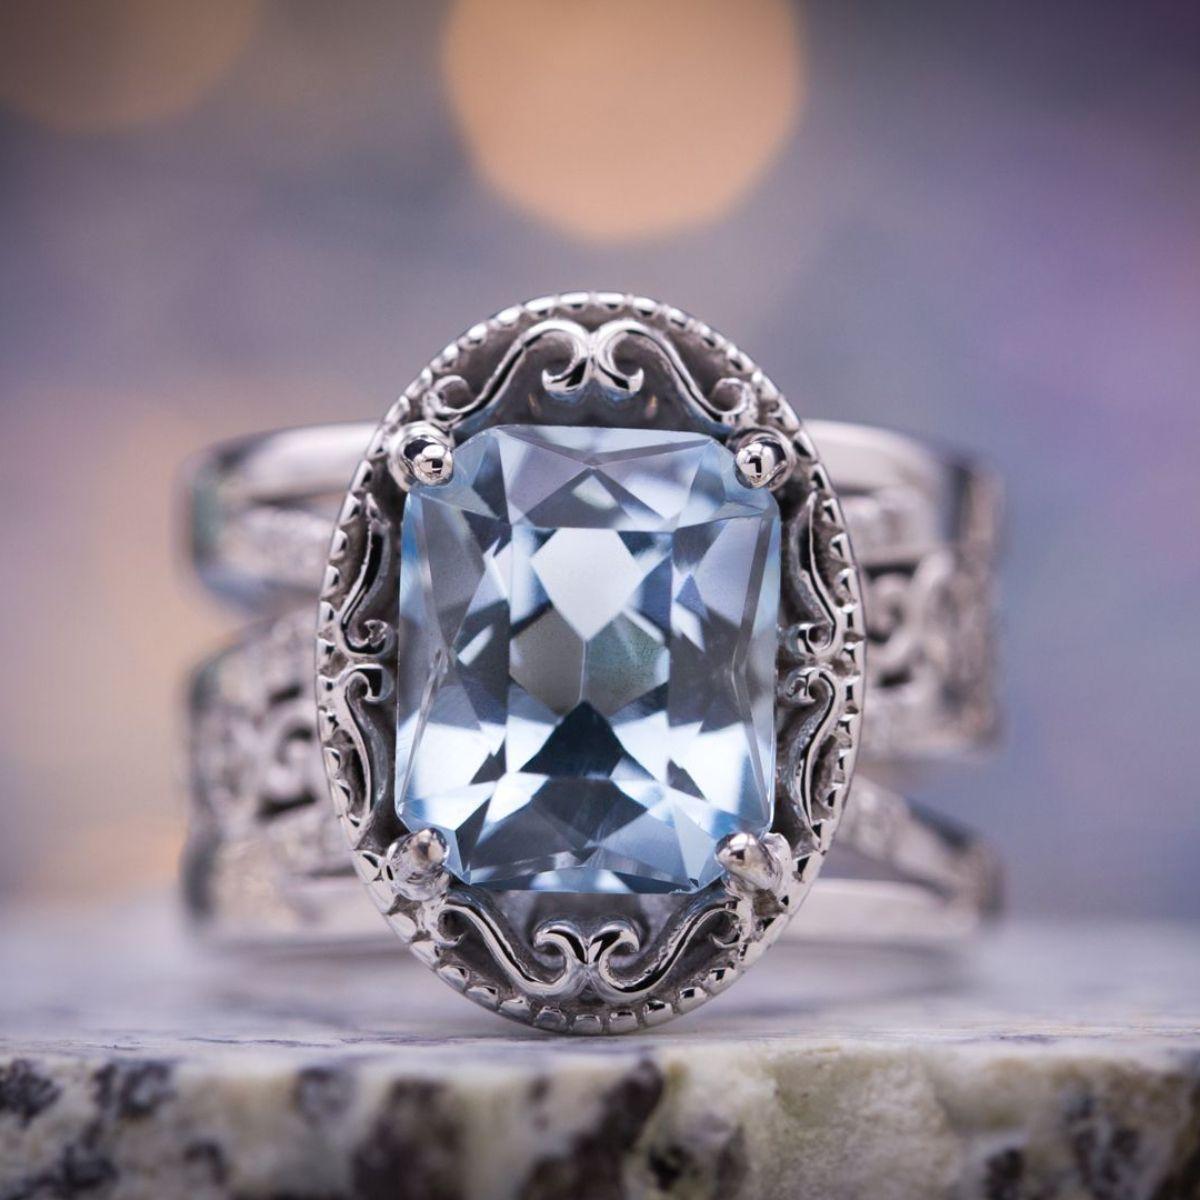 Aquamarine Value Price And Jewelry Information